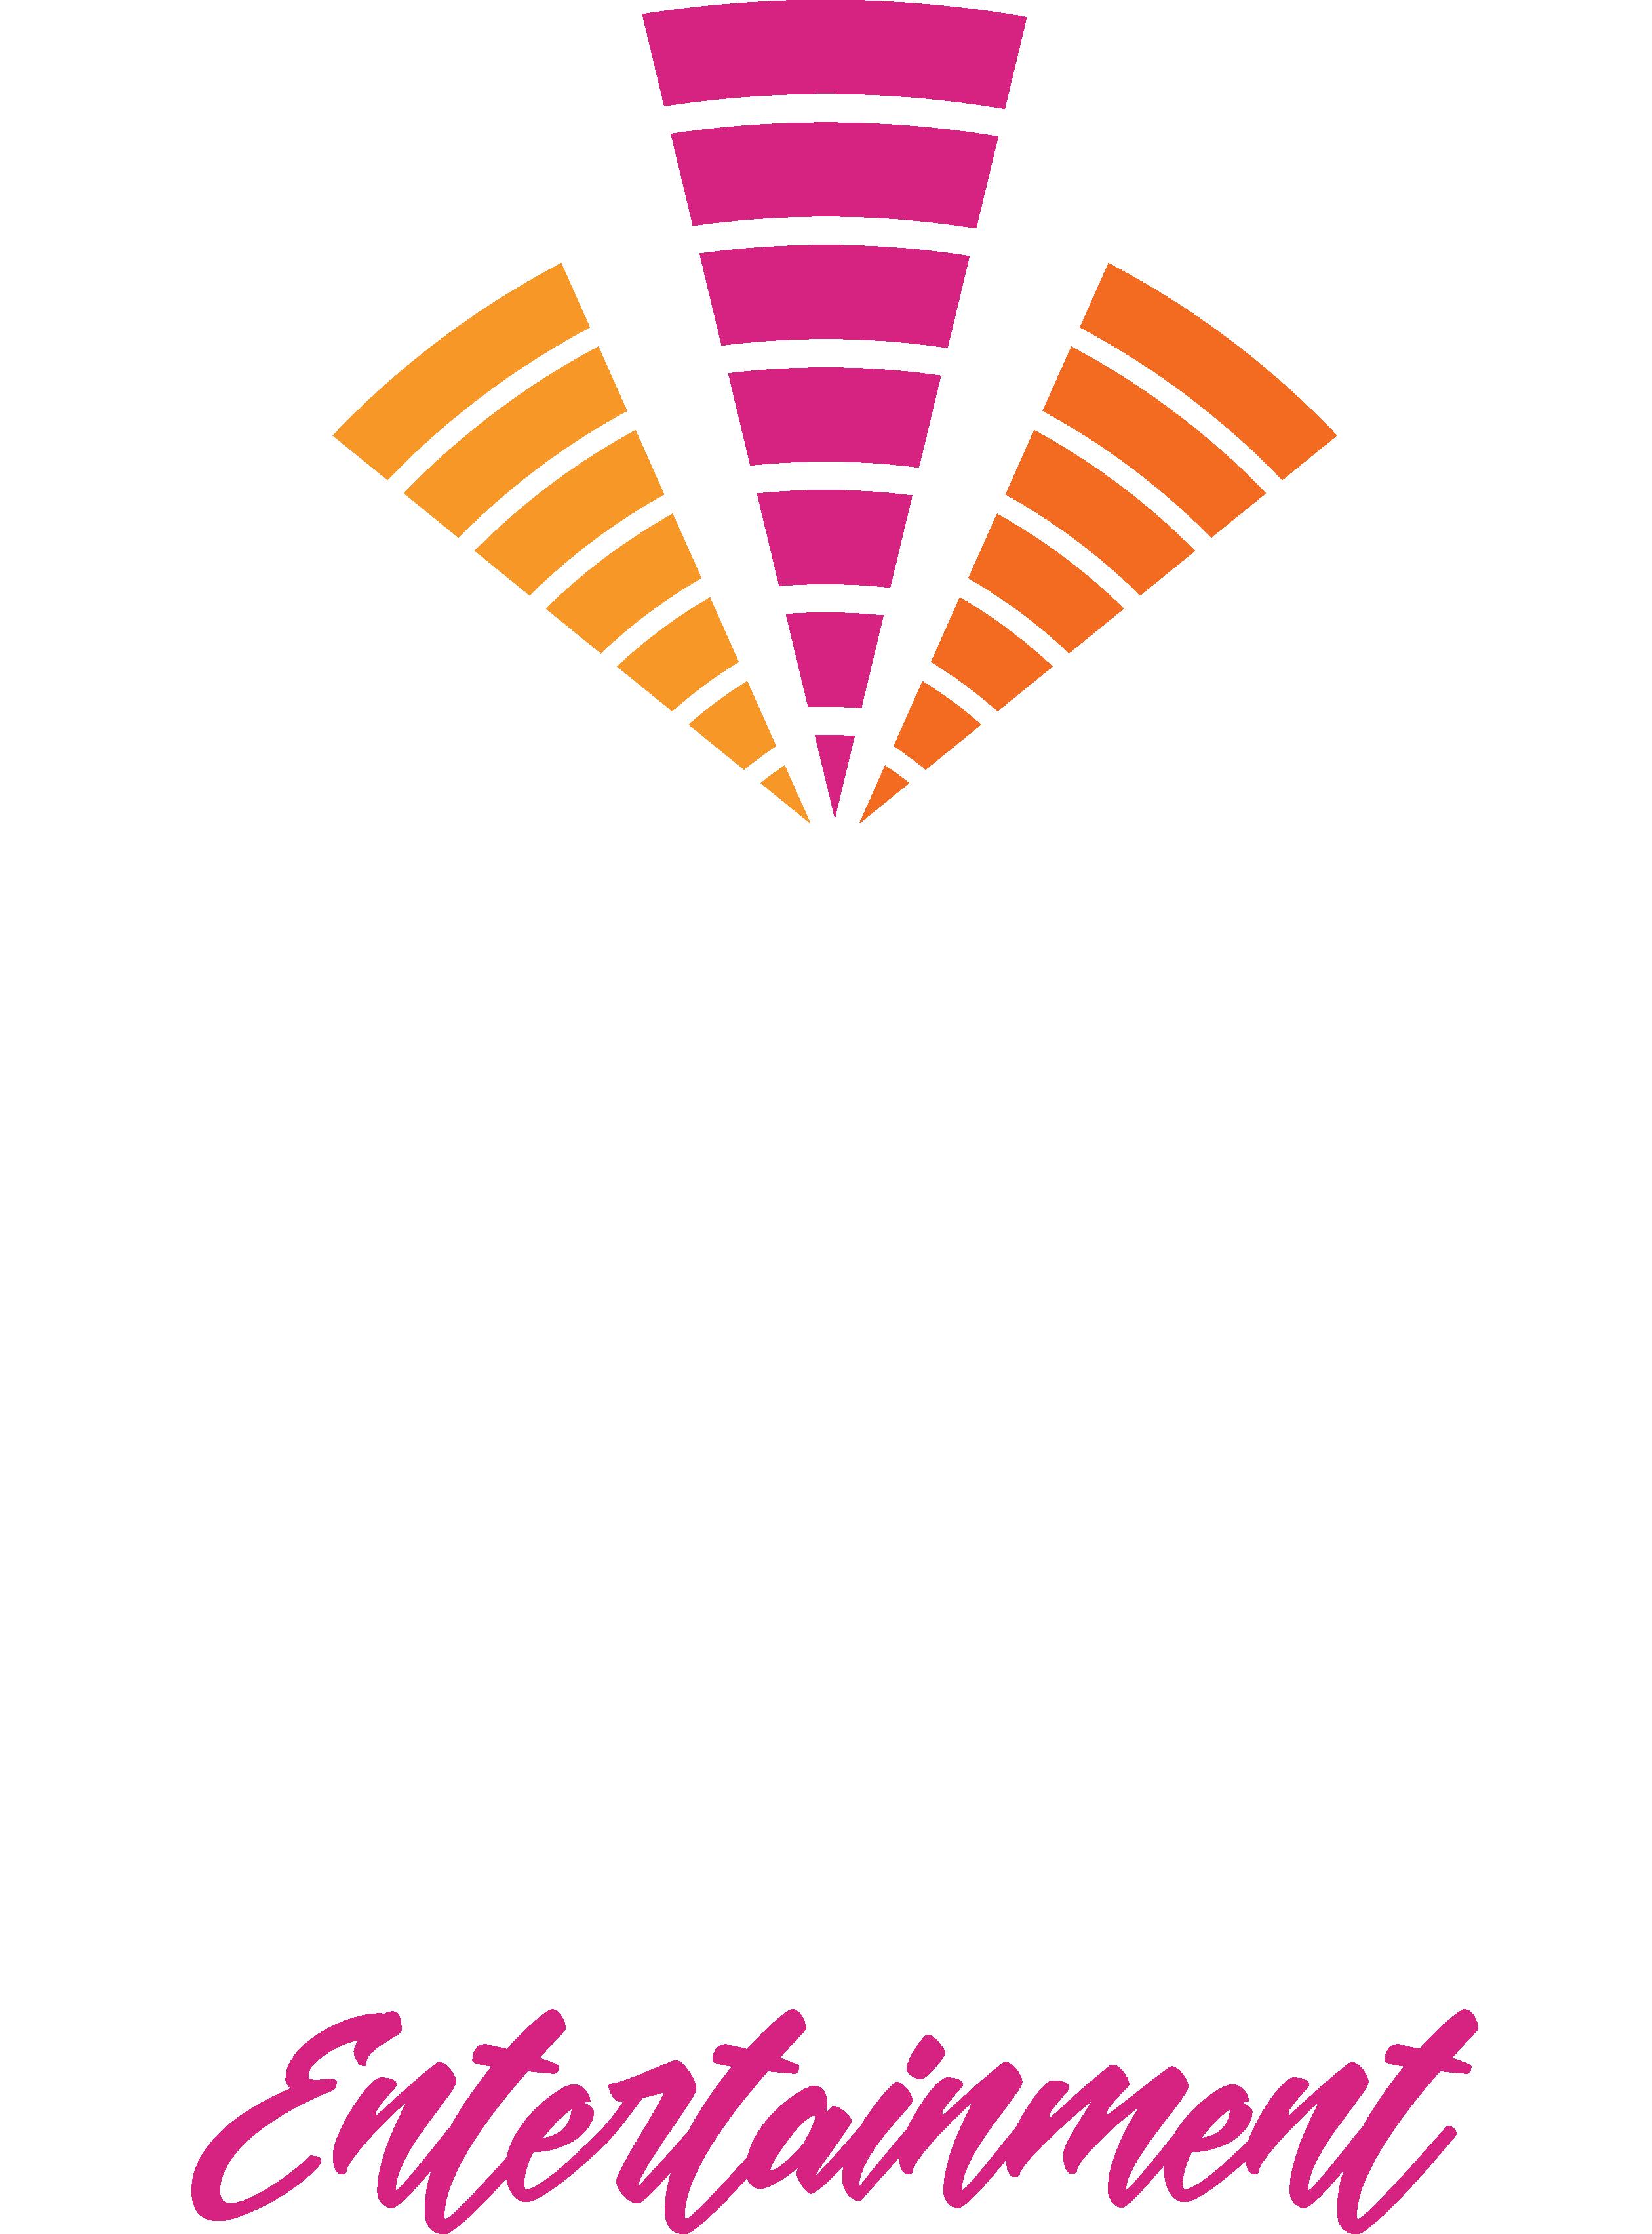 Event lighting clipart #8